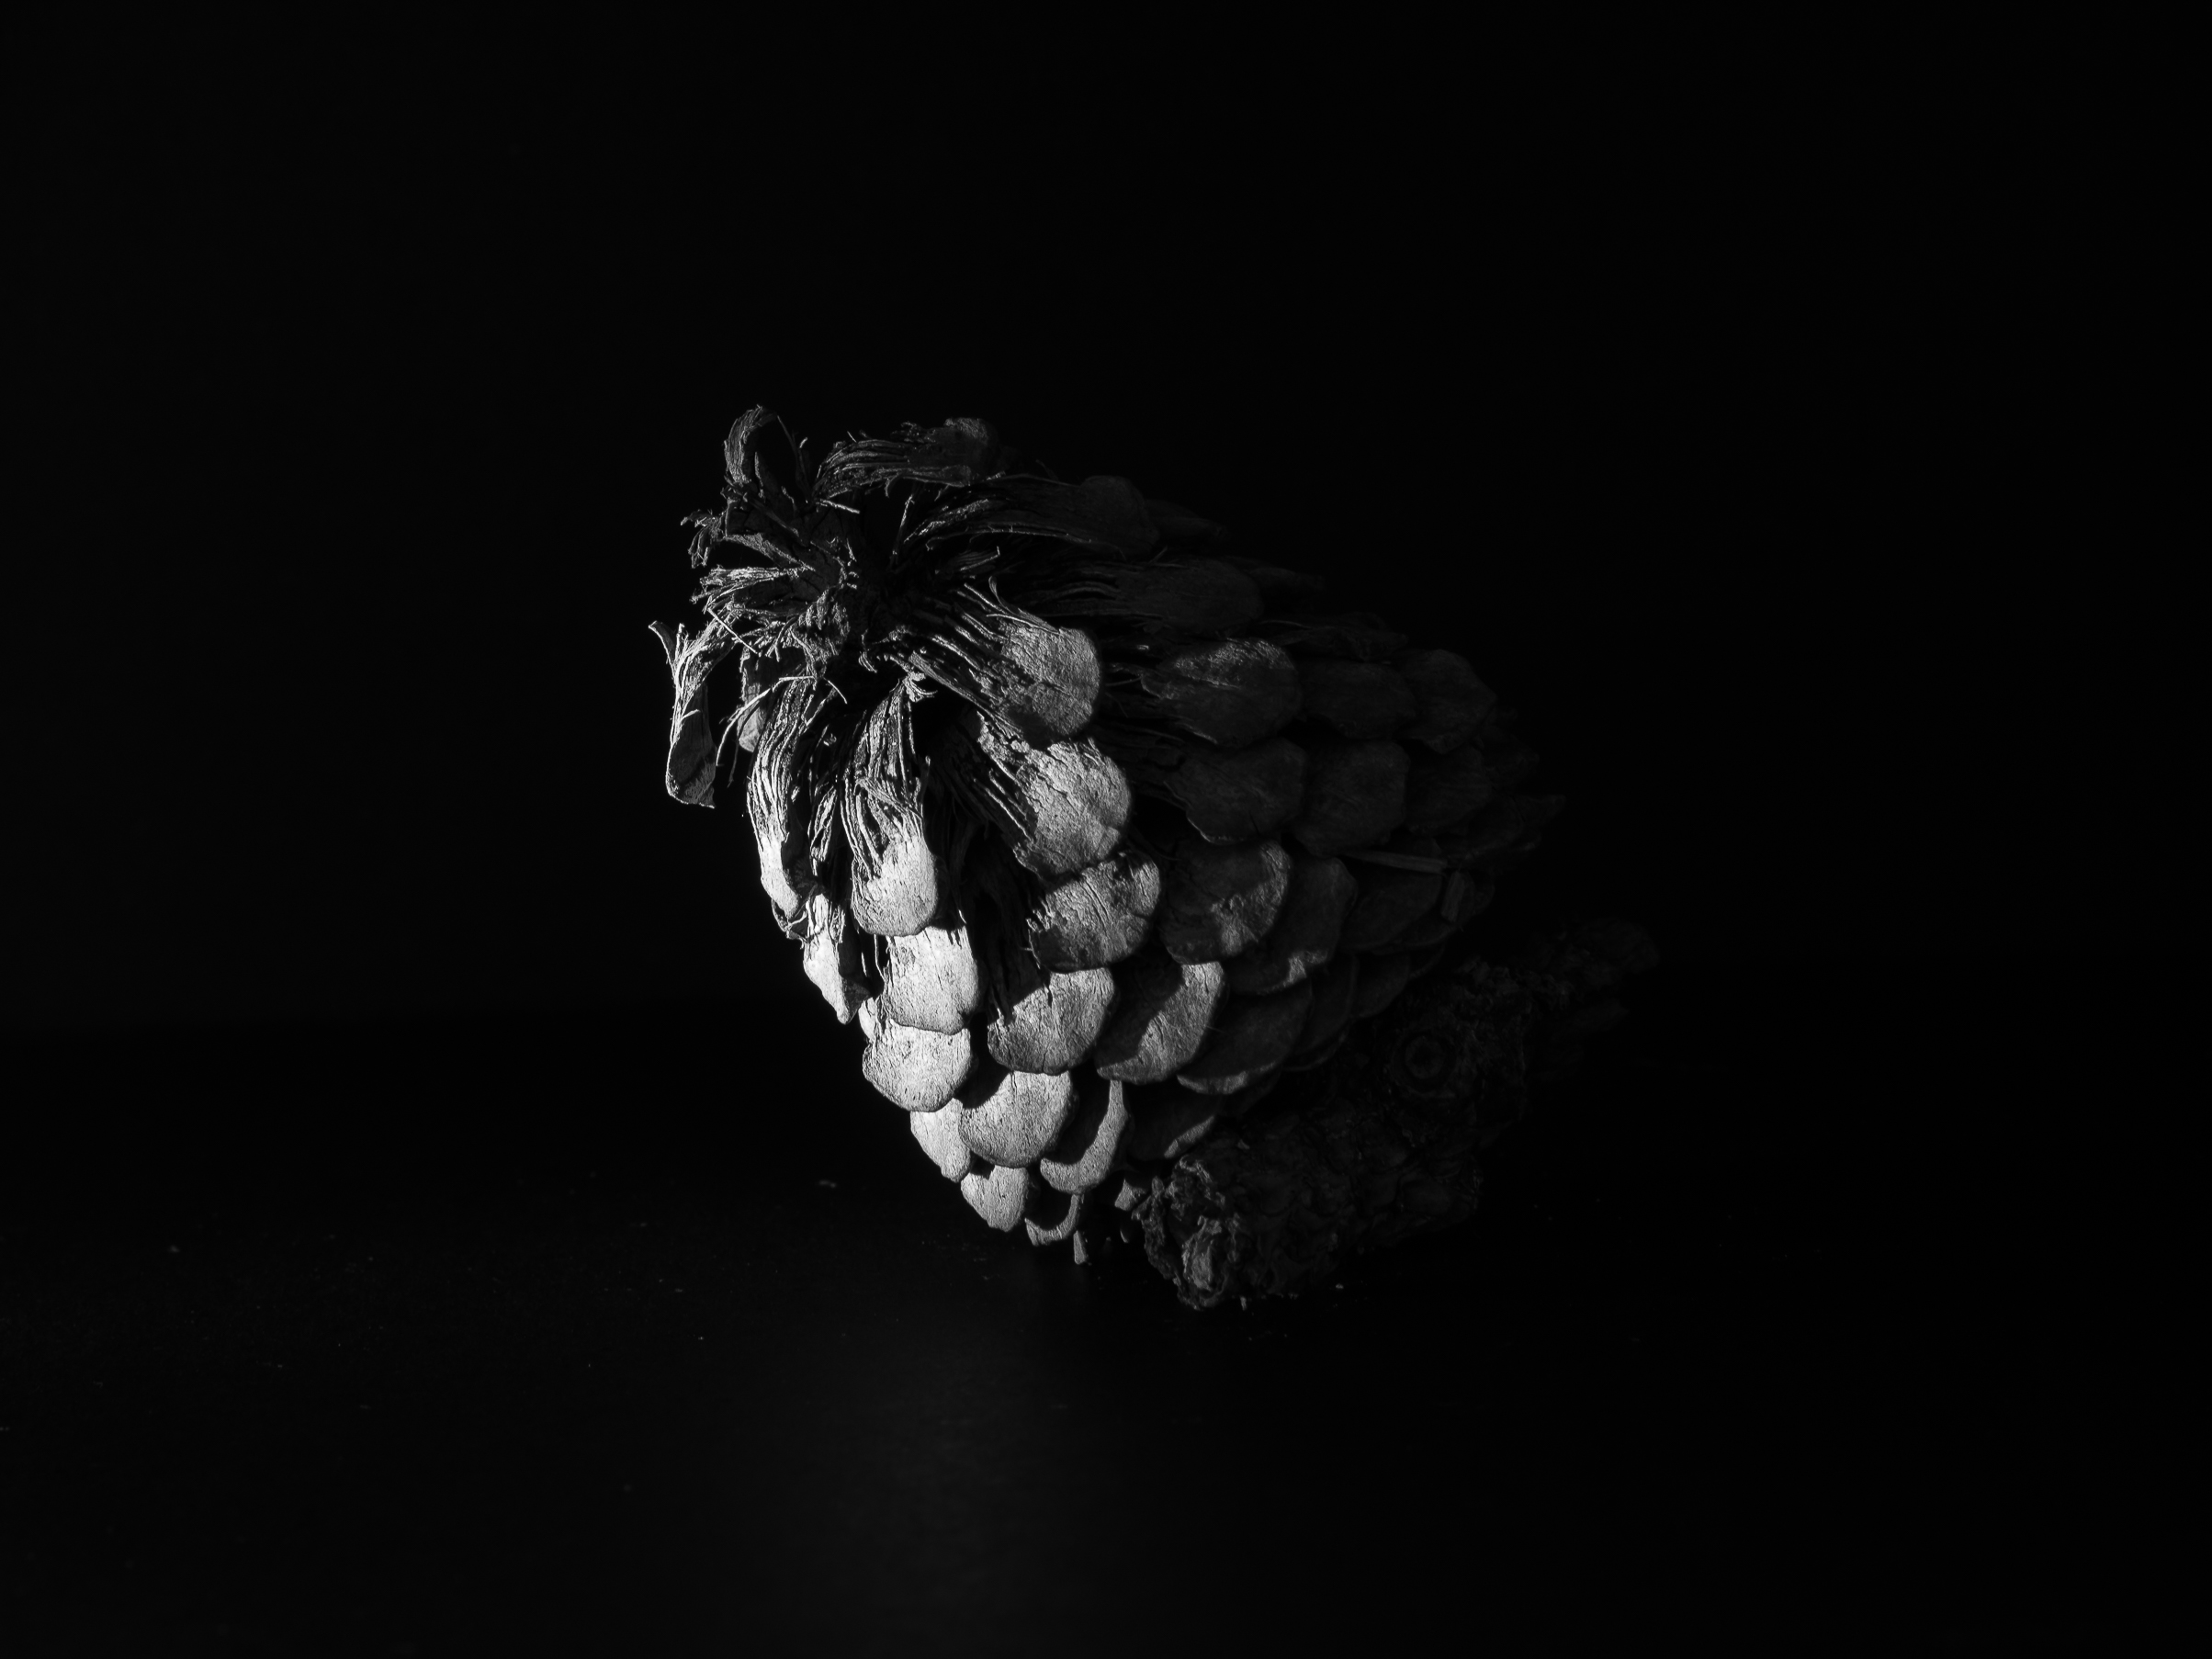 Pine Cone - Copyright 2016 Hannah C. Nesbeda